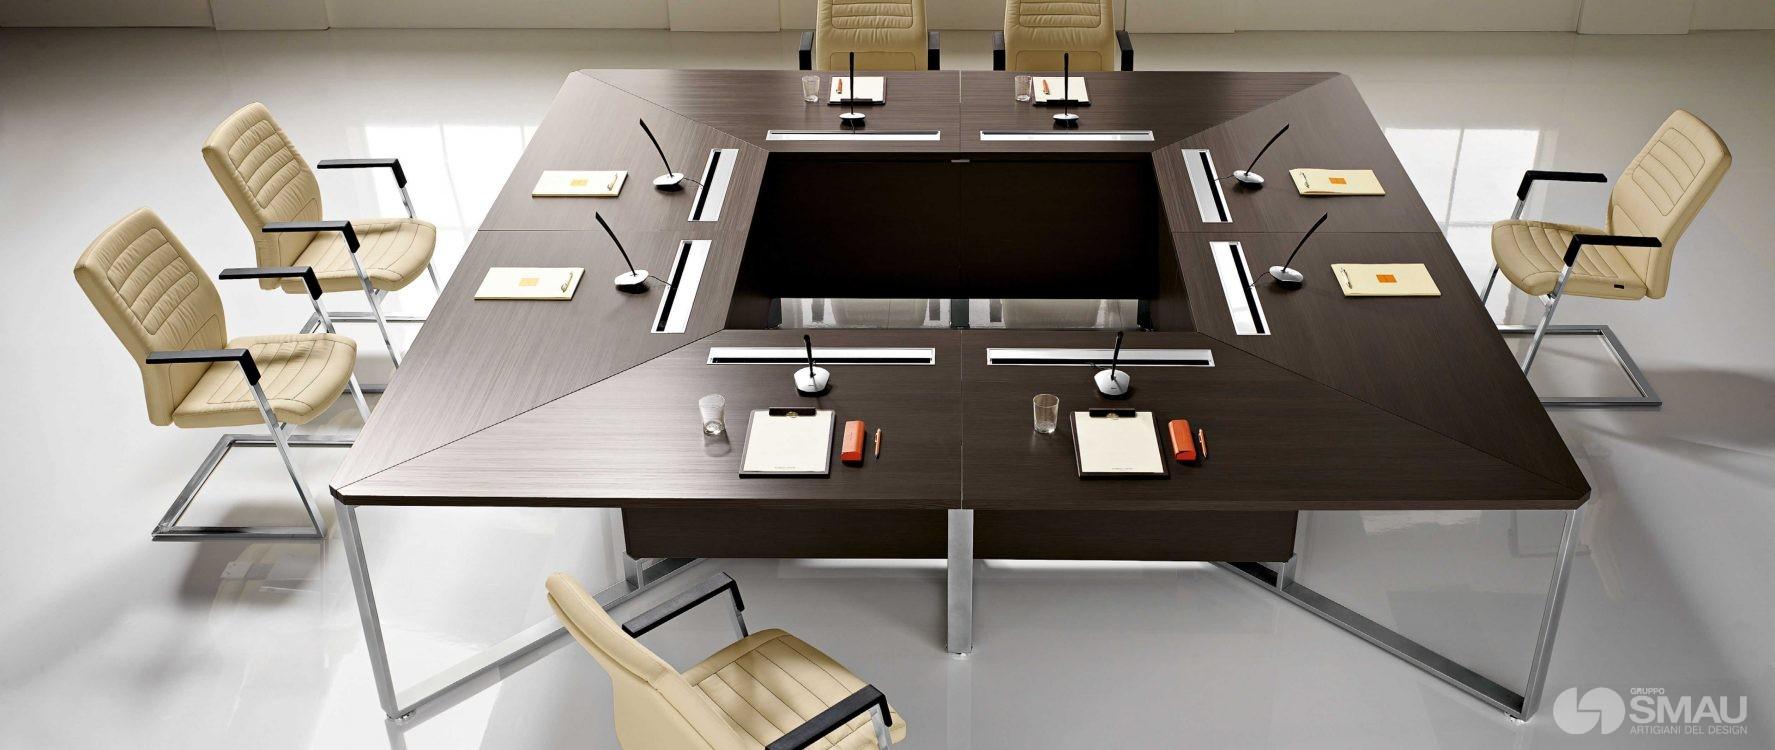 Ufficio presidenziale i meet gruppo smau for Arredo ufficio presidenziale